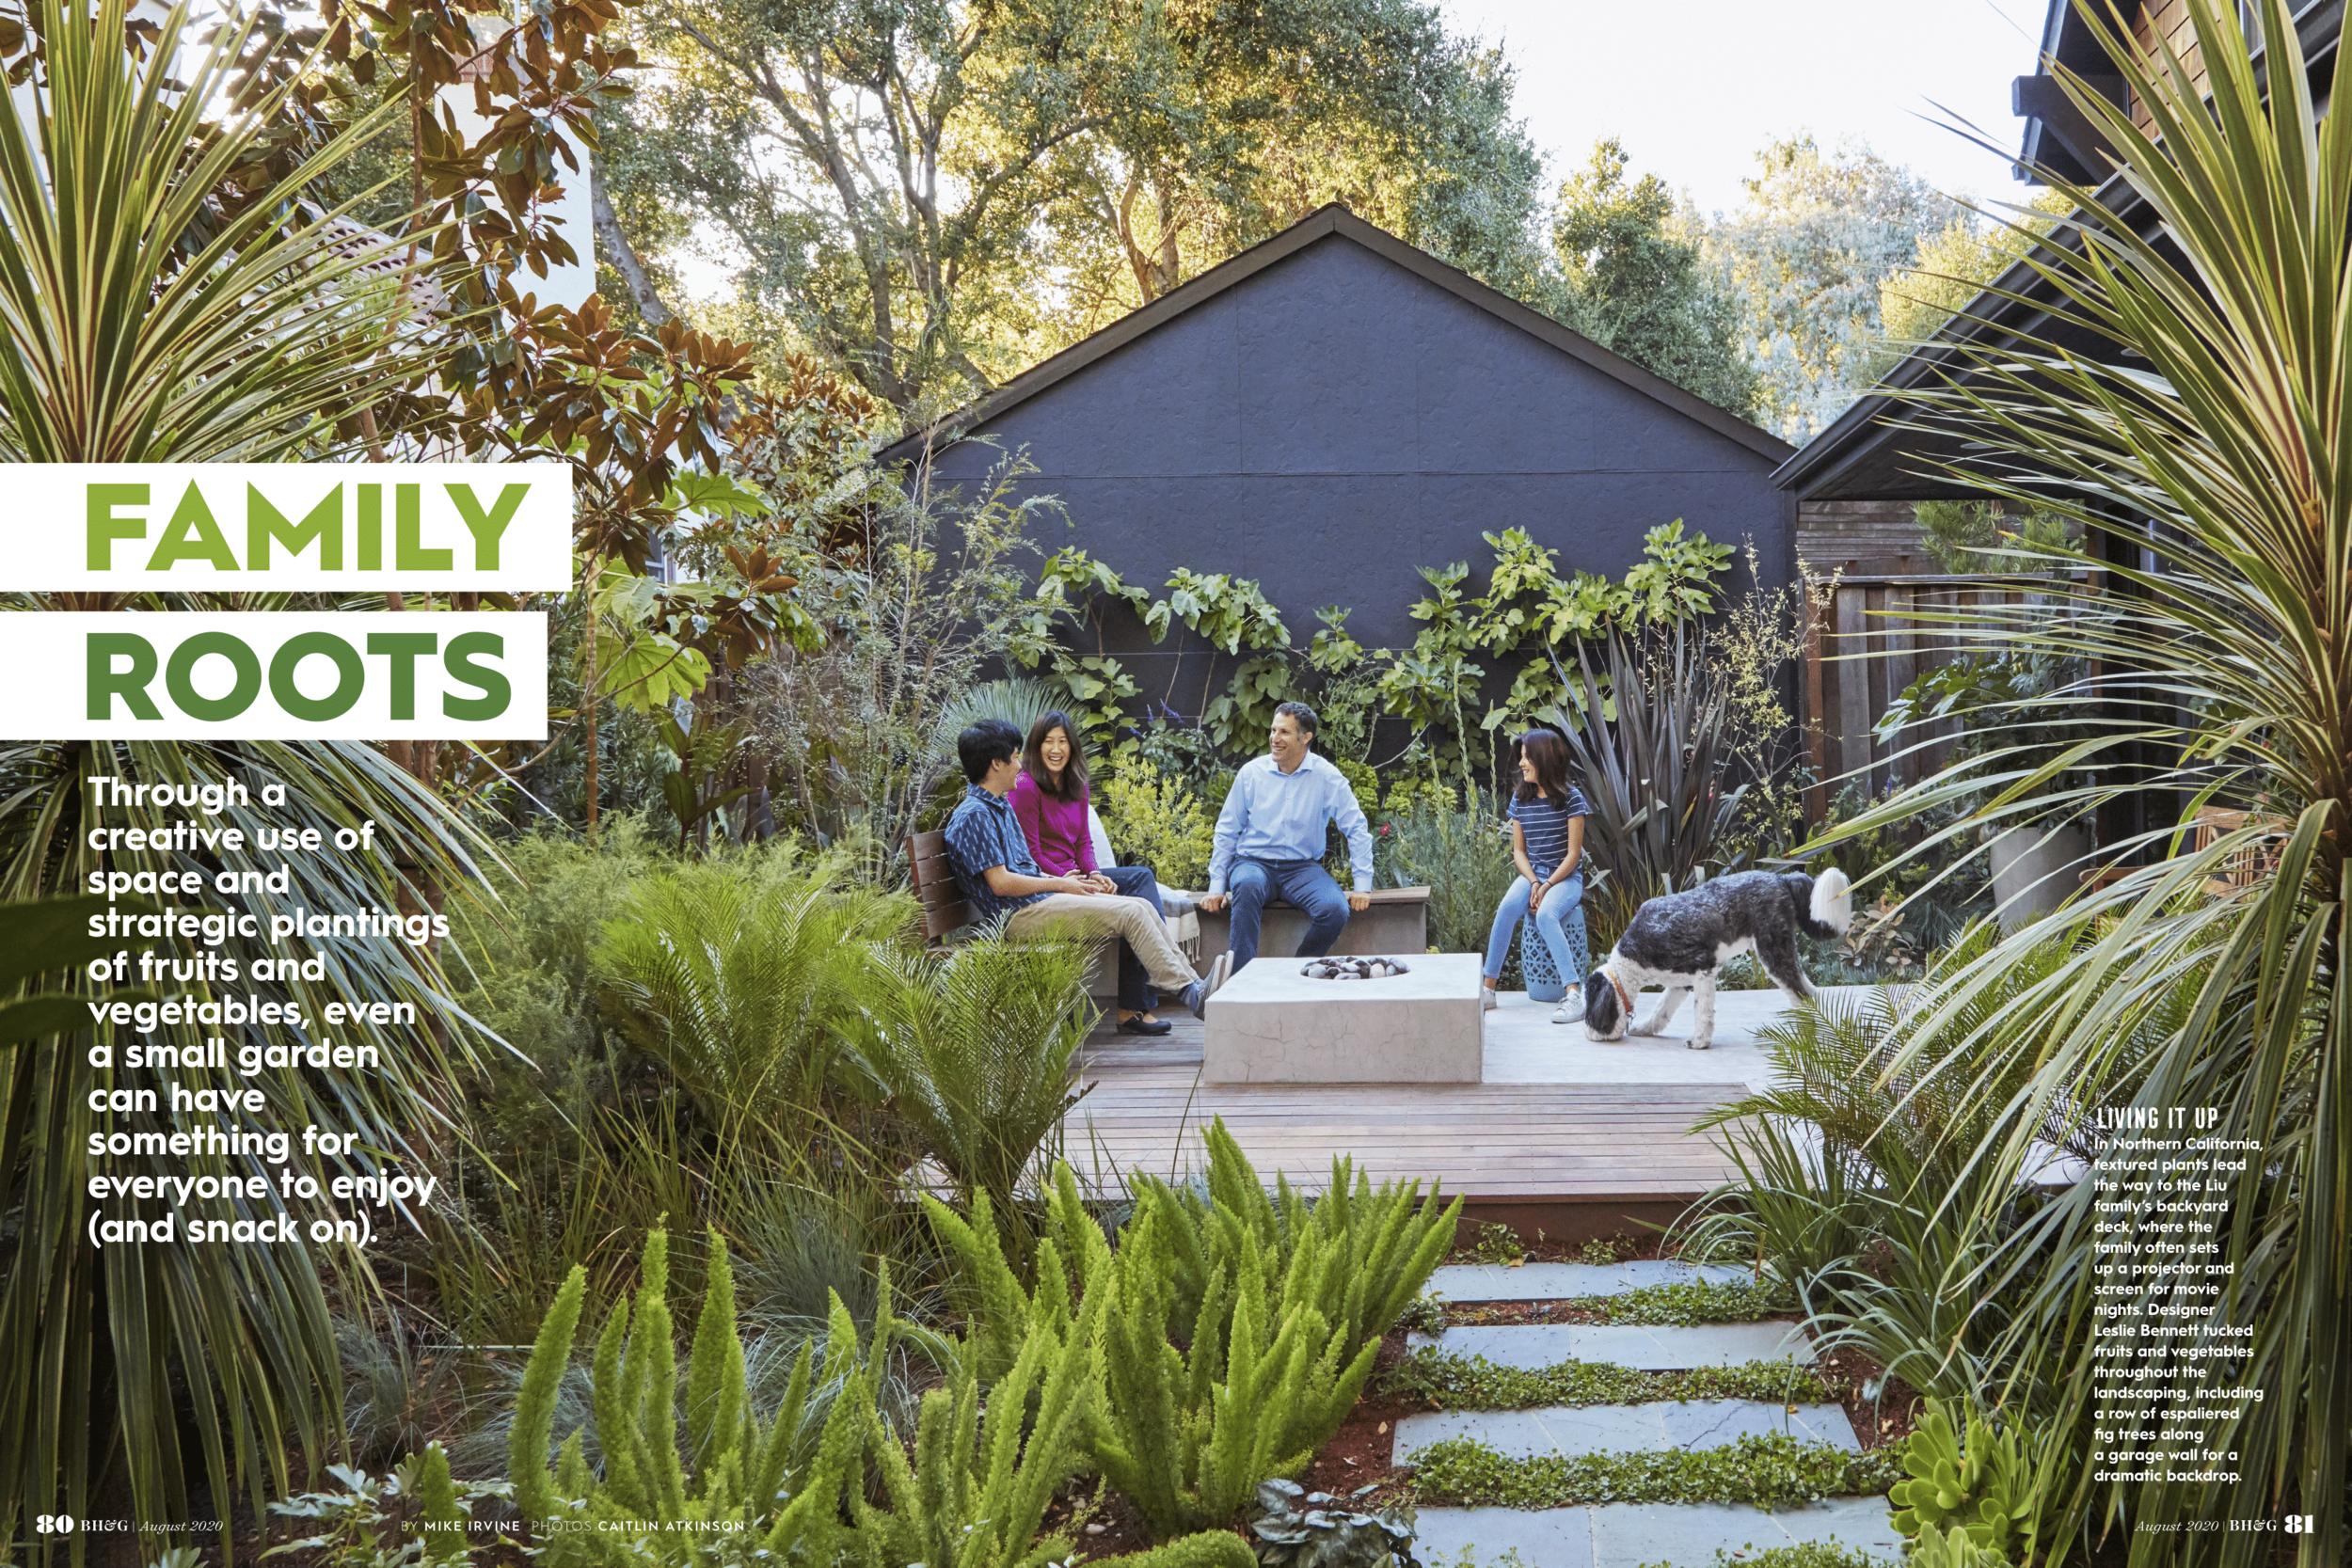 Family Root Better Homes Gardens Magazine August 2020 Pine House Edible Gardens